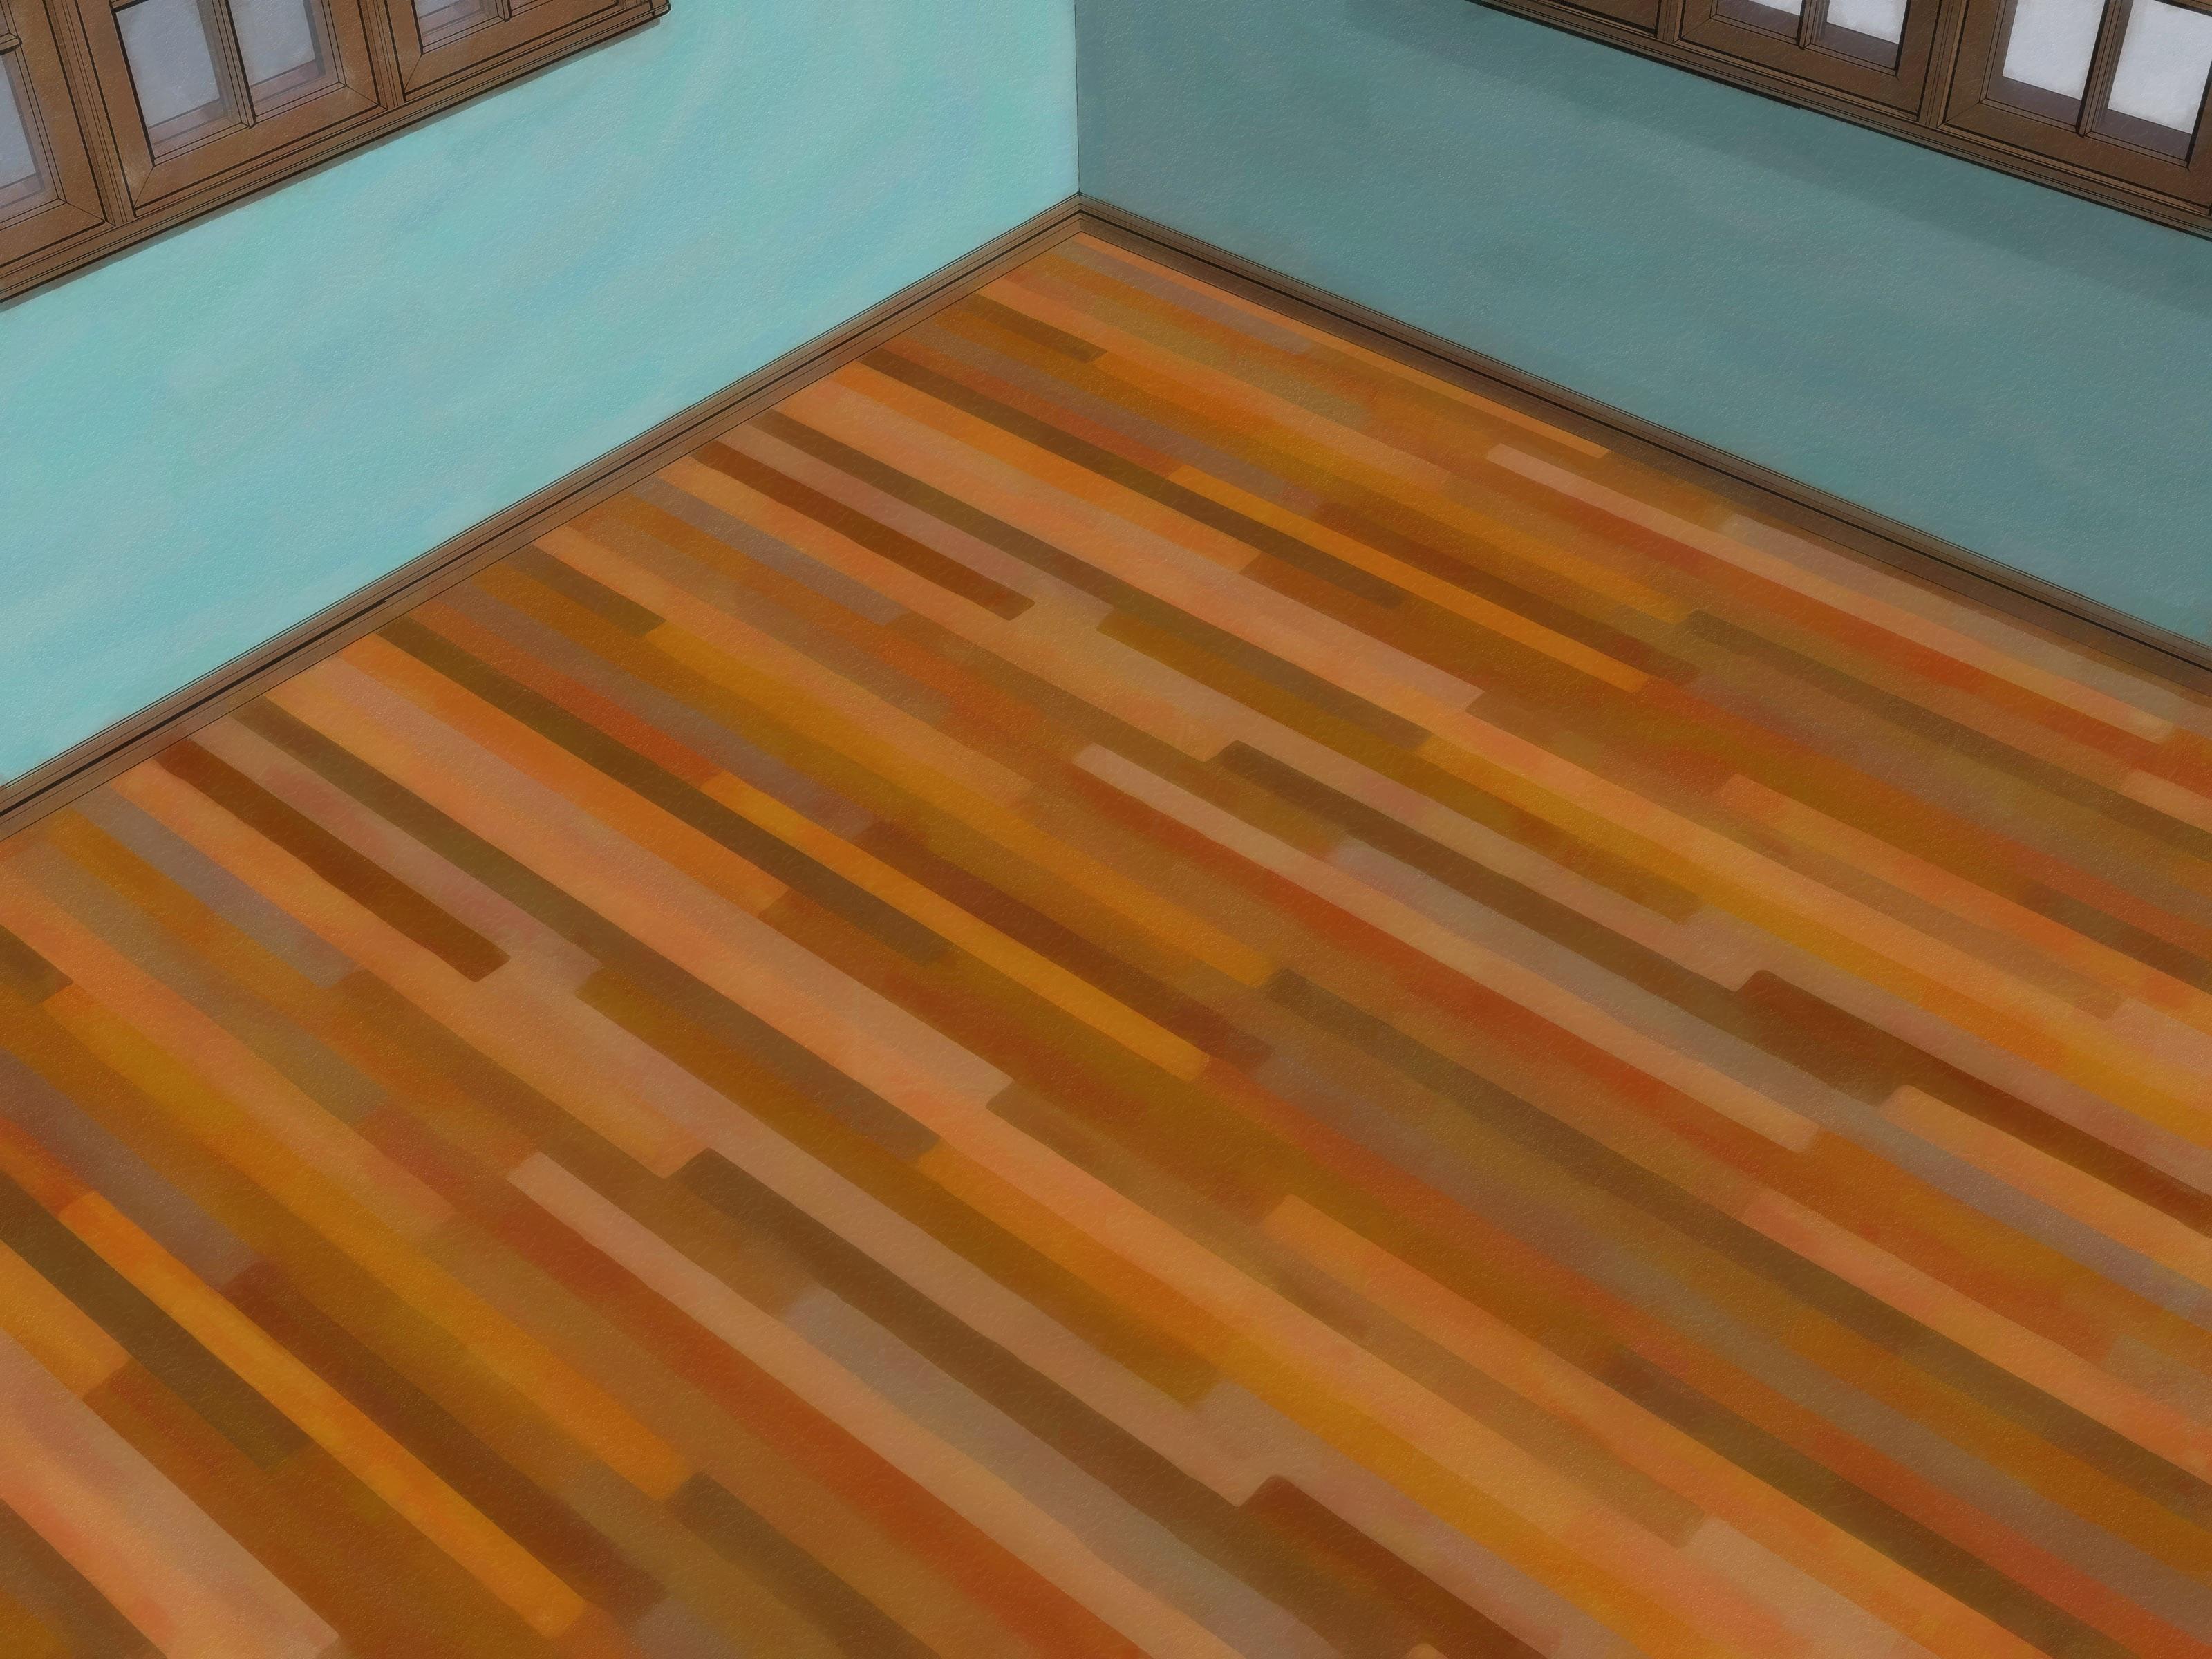 glue down hardwood flooring cost of 16 fresh hardwood floor polish photos dizpos com pertaining to 50 inspirational sanding and refinishing hardwood floors graphics